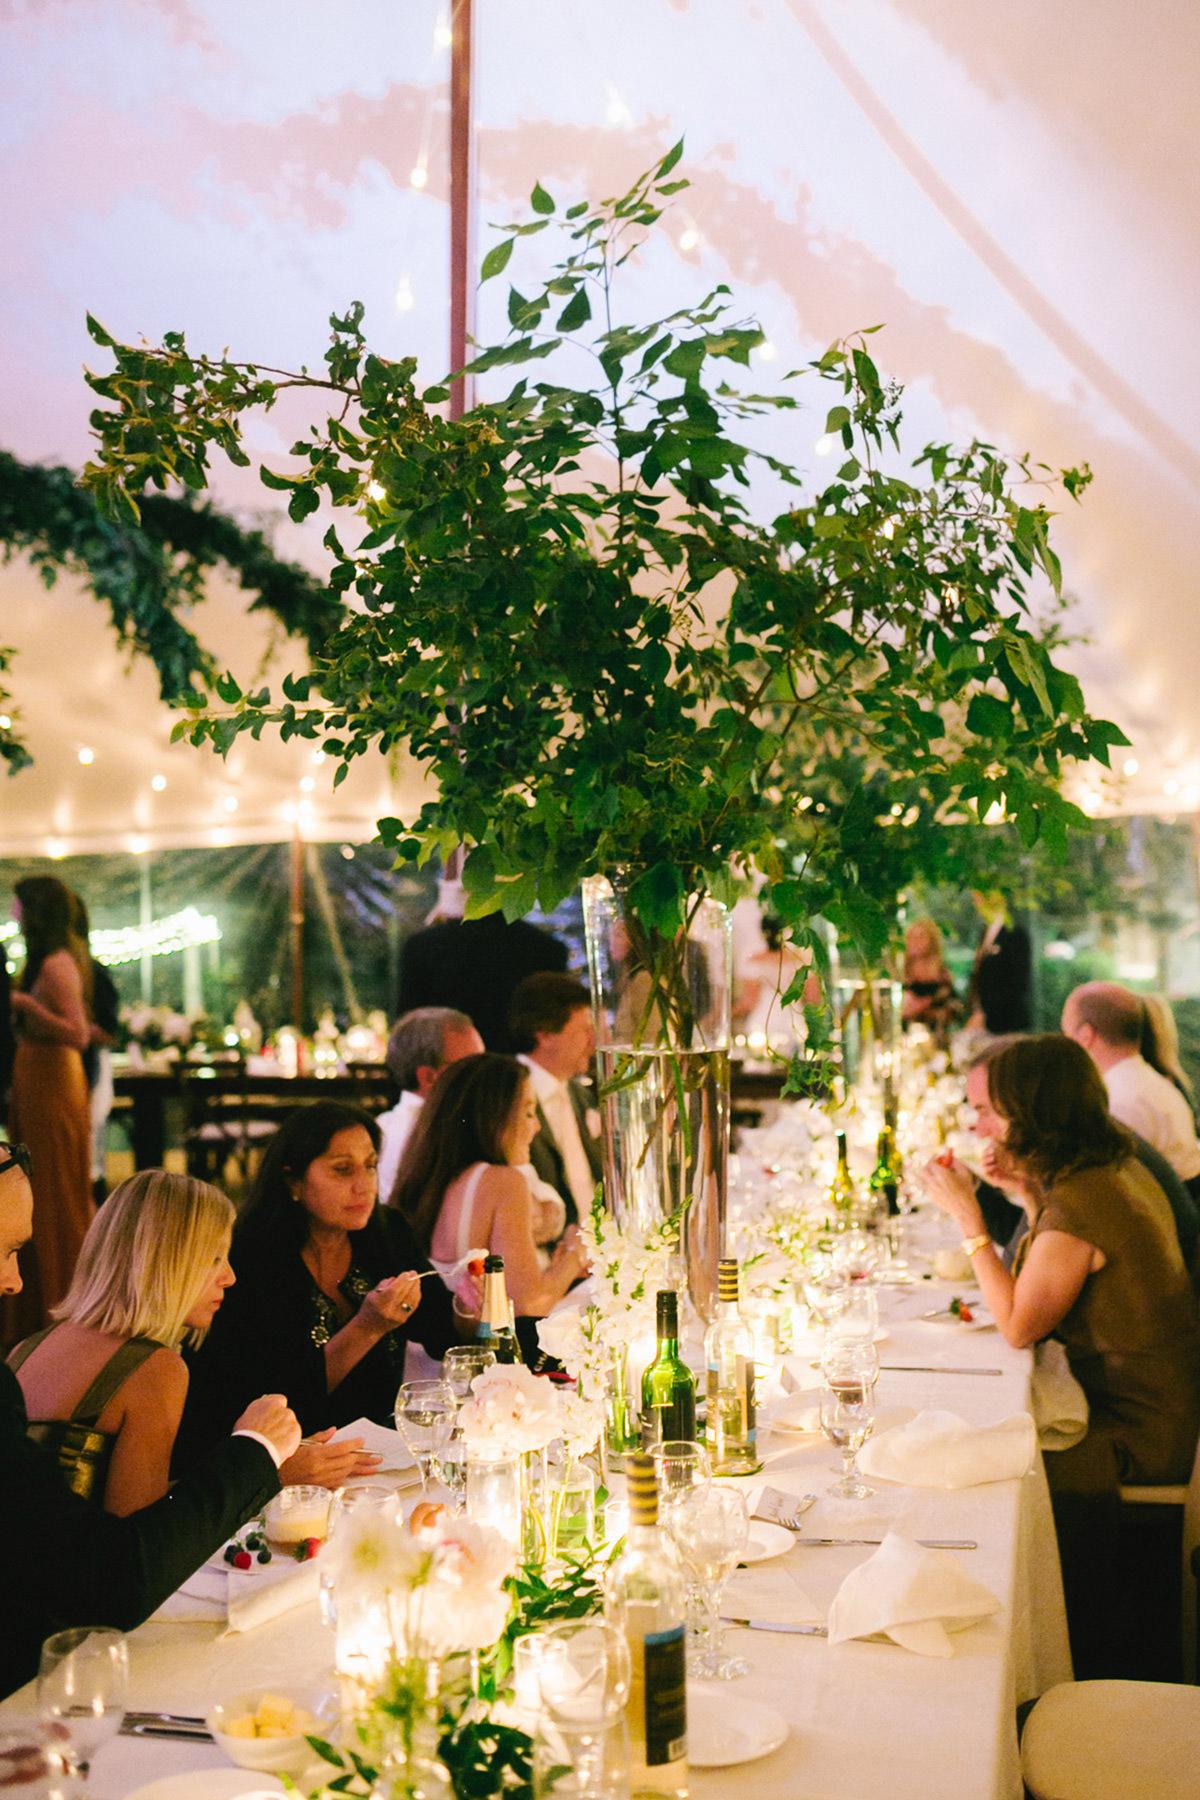 artiese-studios-vineyard-bride-swish-list-private-estate-cambridge-wedding-20.jpg